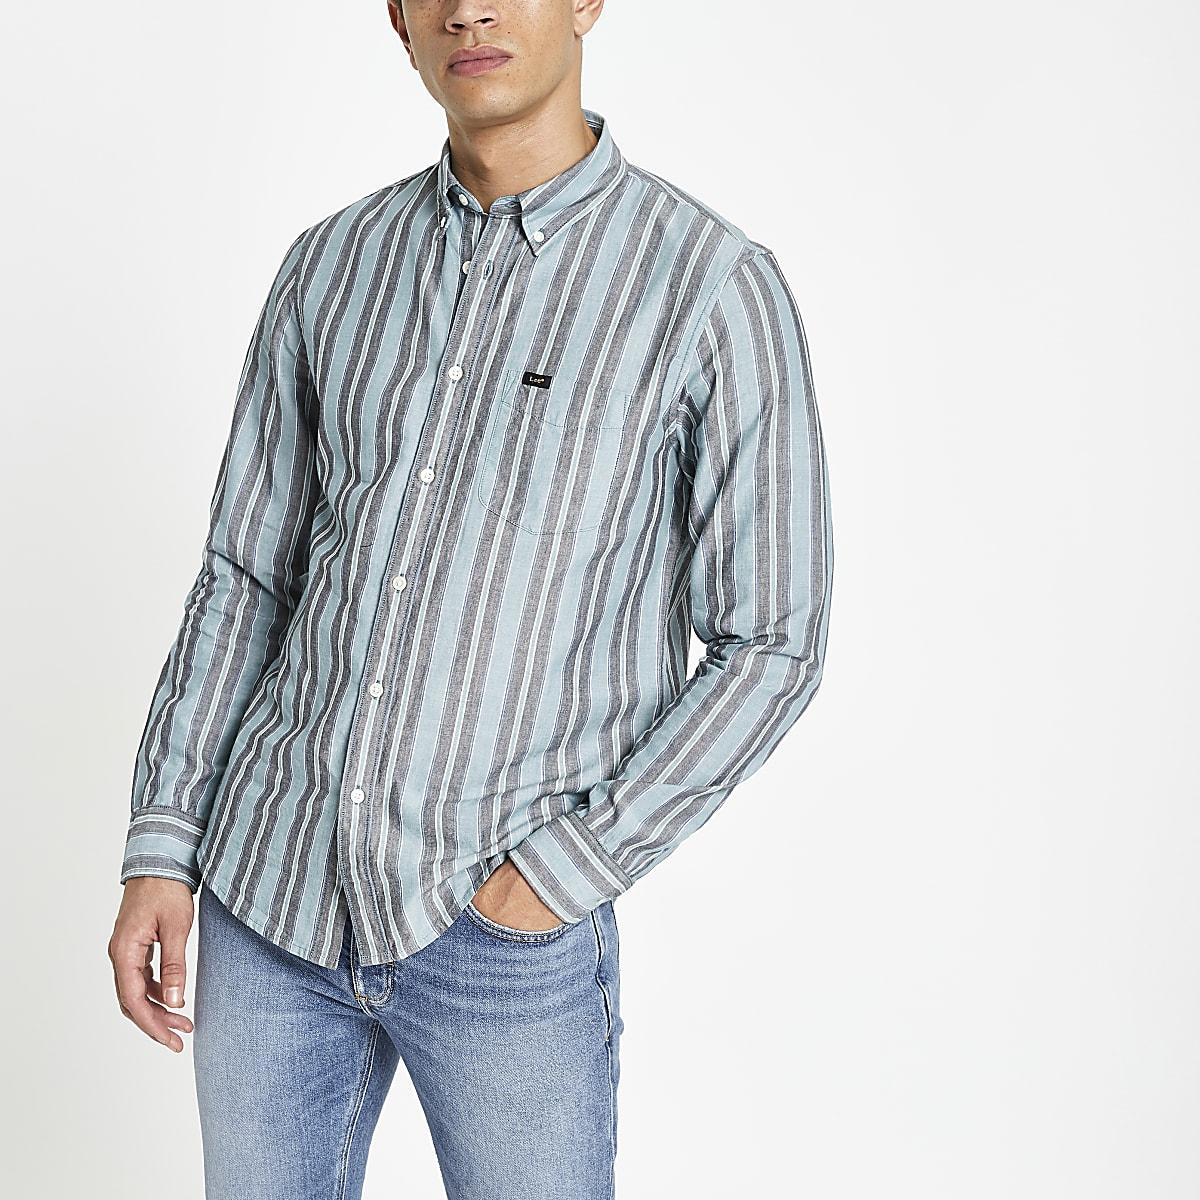 Lee green stripe long sleeve shirt